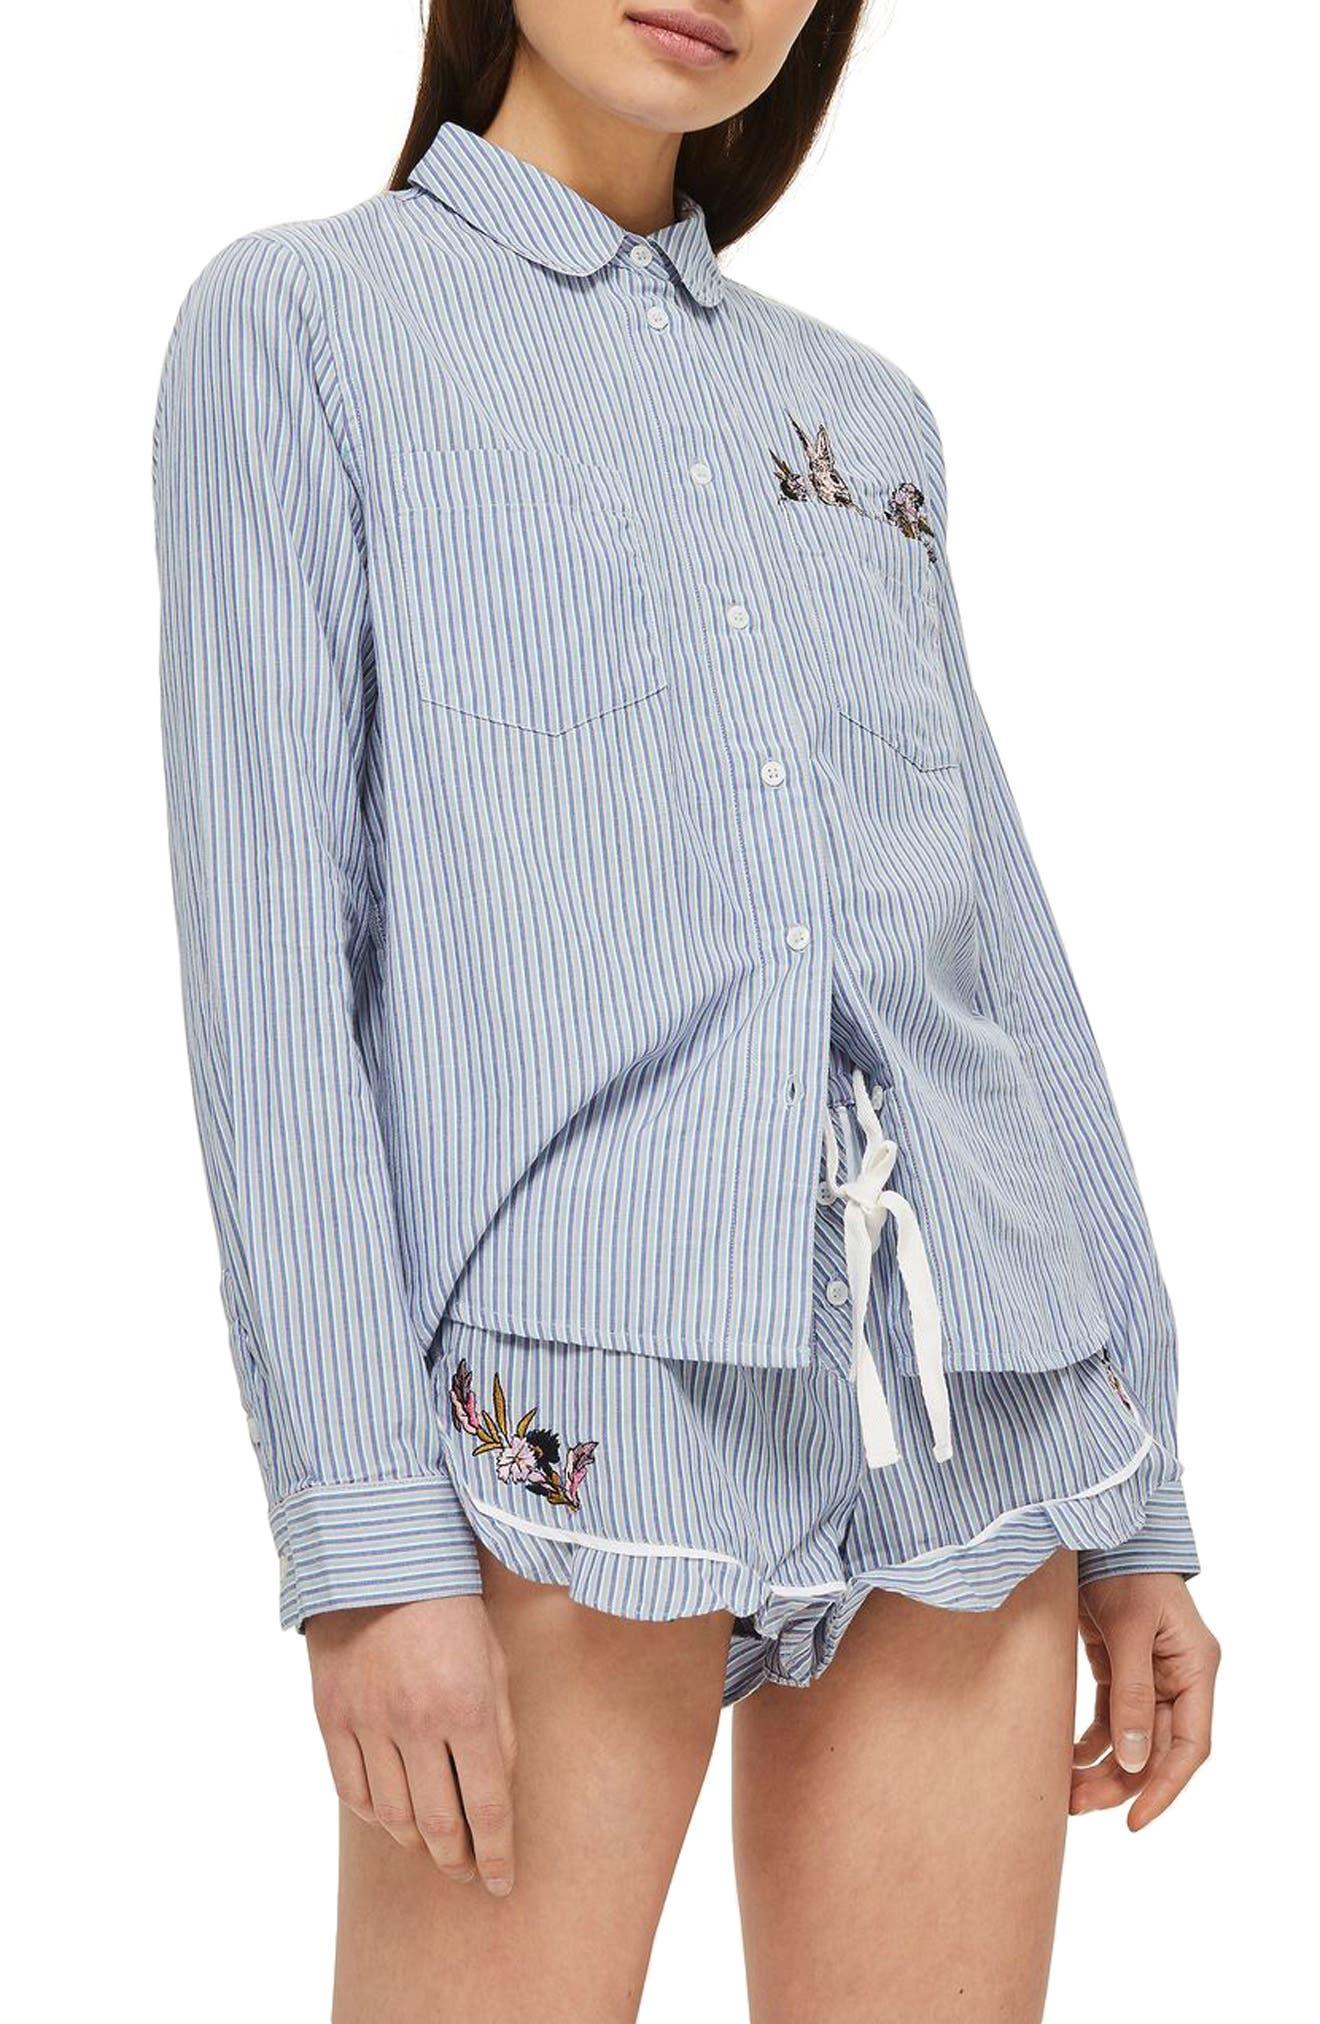 Main Image - Topshop Bunny Embroidered Short Pajamas